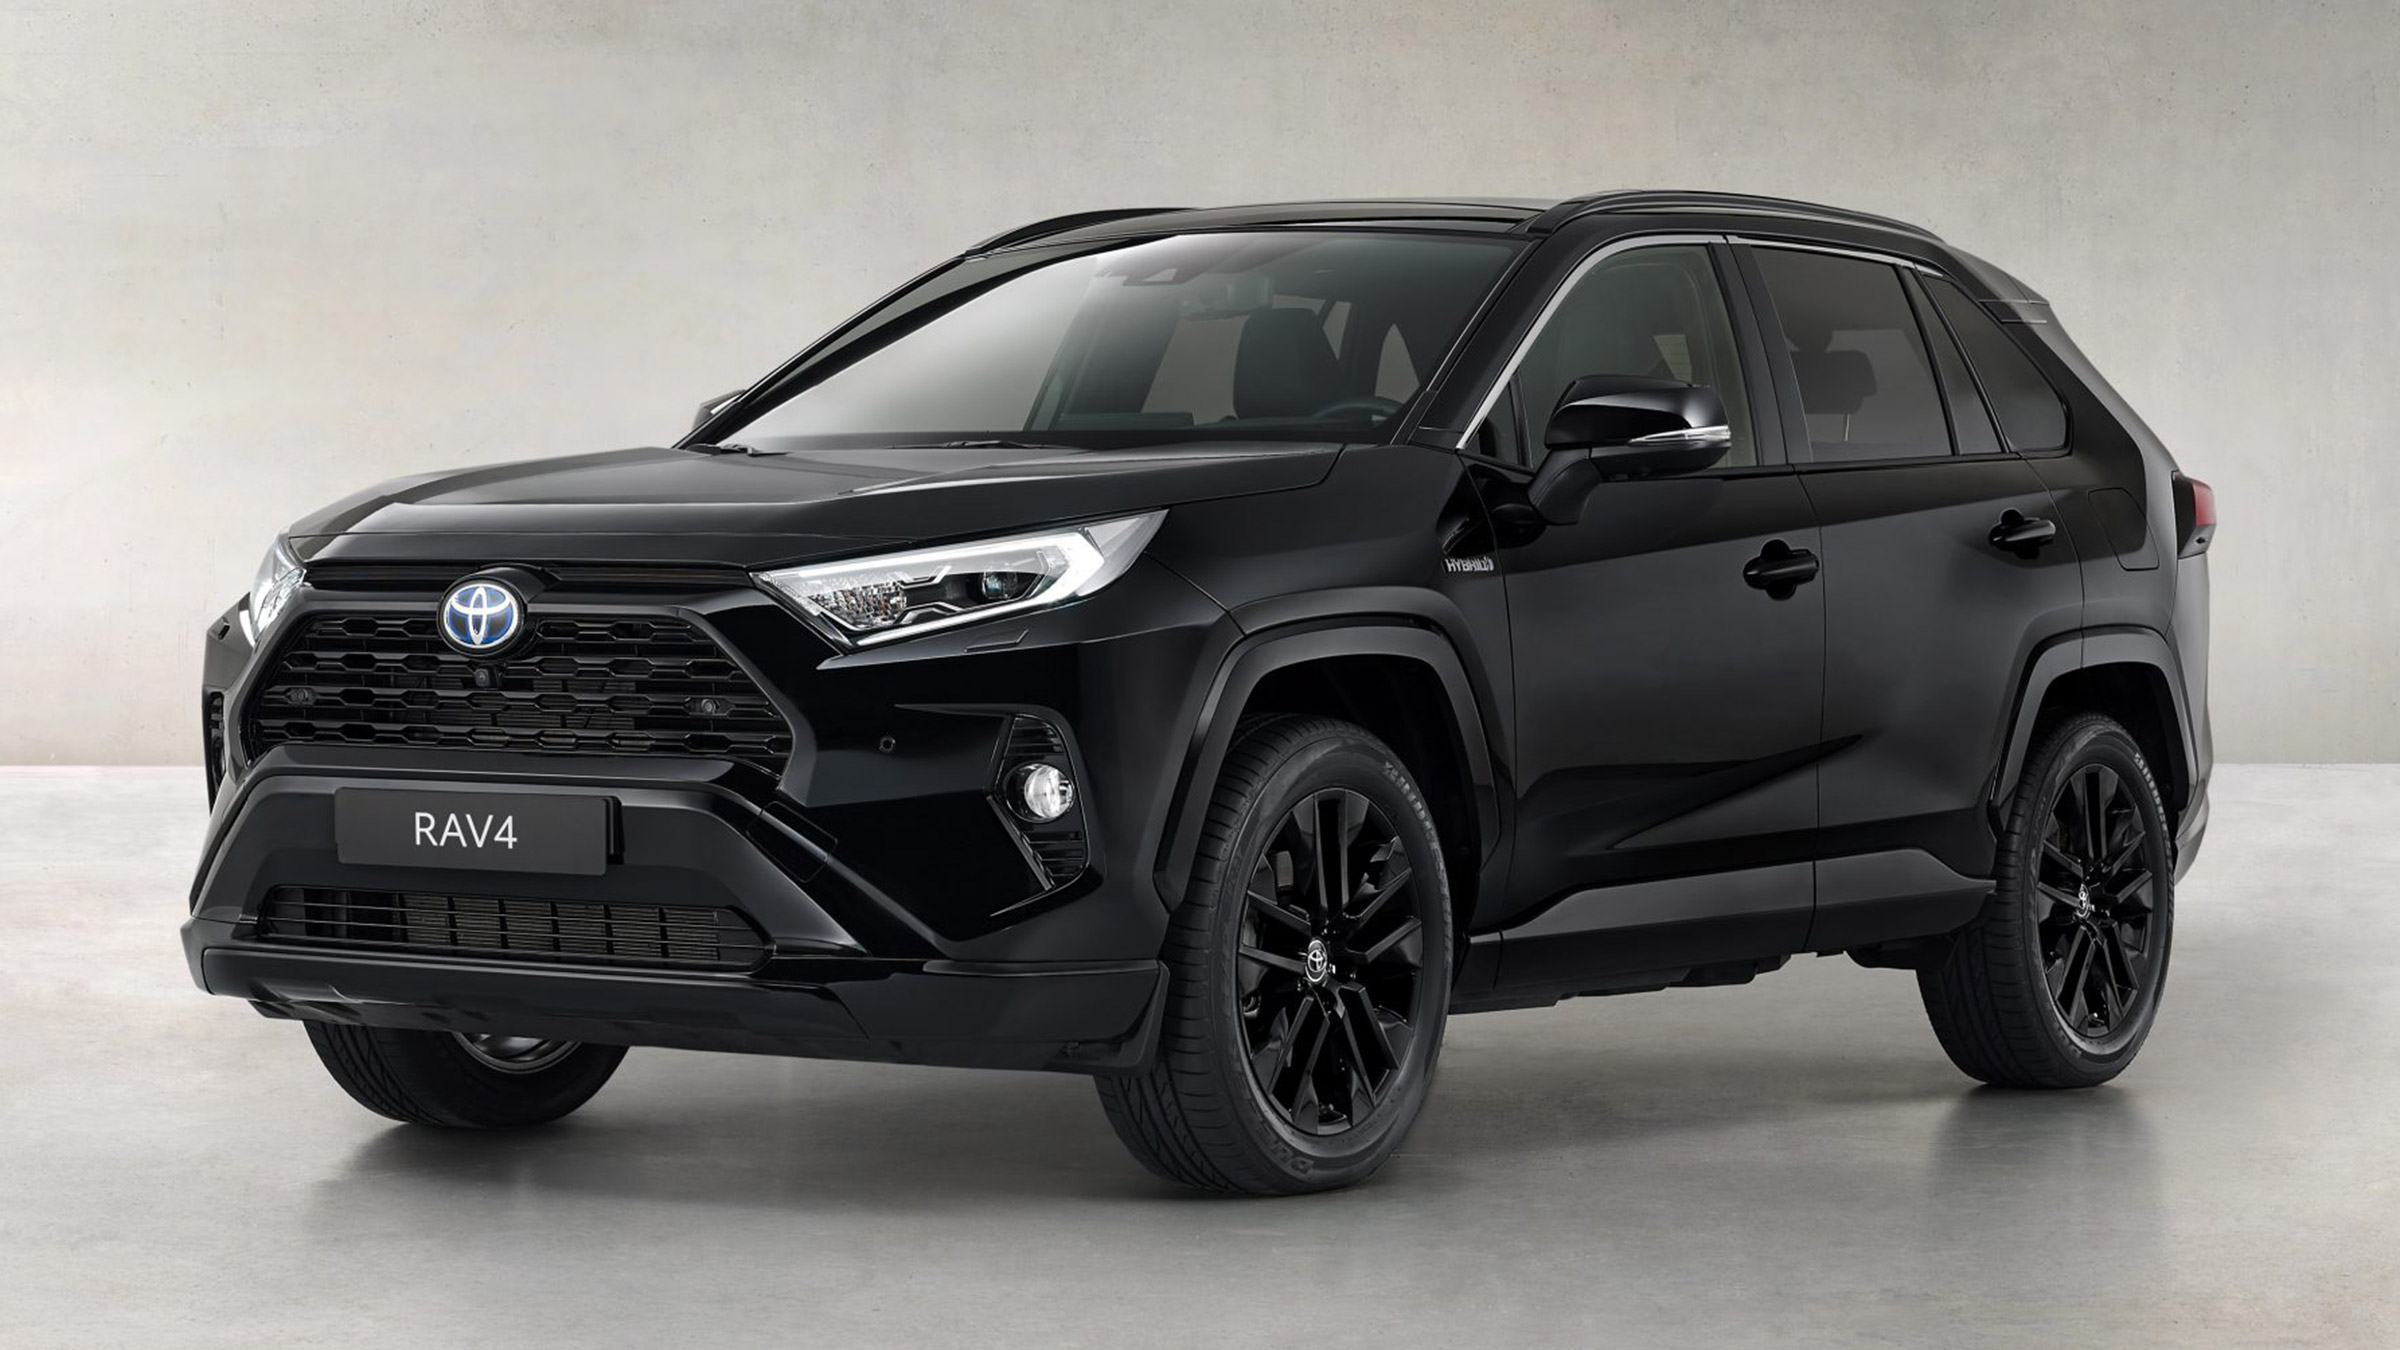 New 2020 Toyota Rav4 Black Edition Added To Line